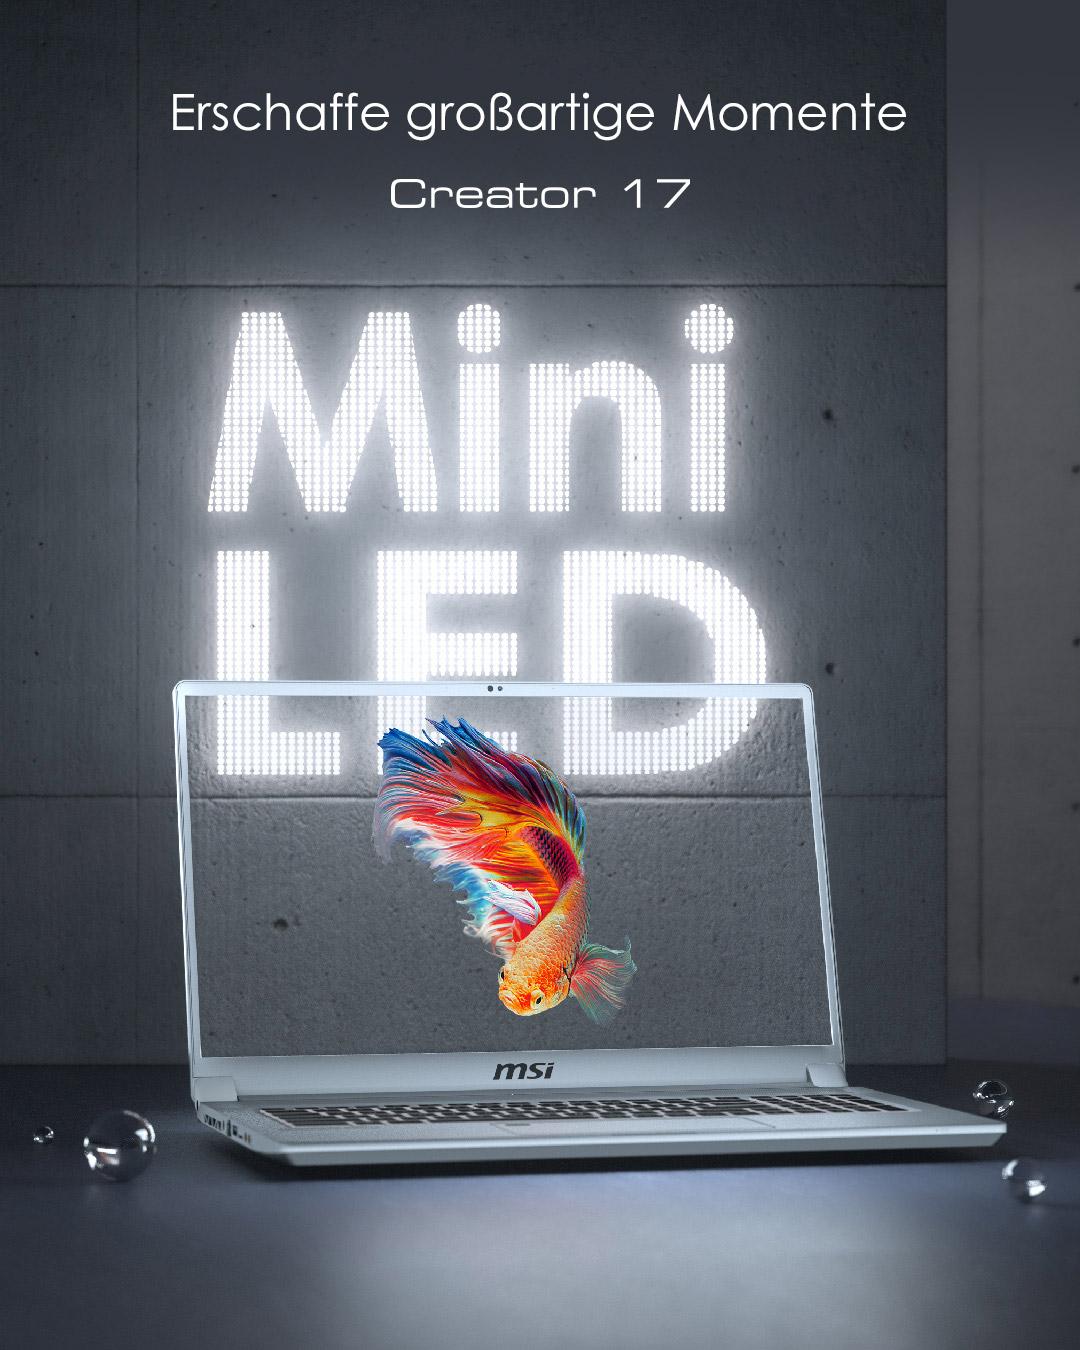 CREATOR 17 CREATE SPLENDID MOMENTS